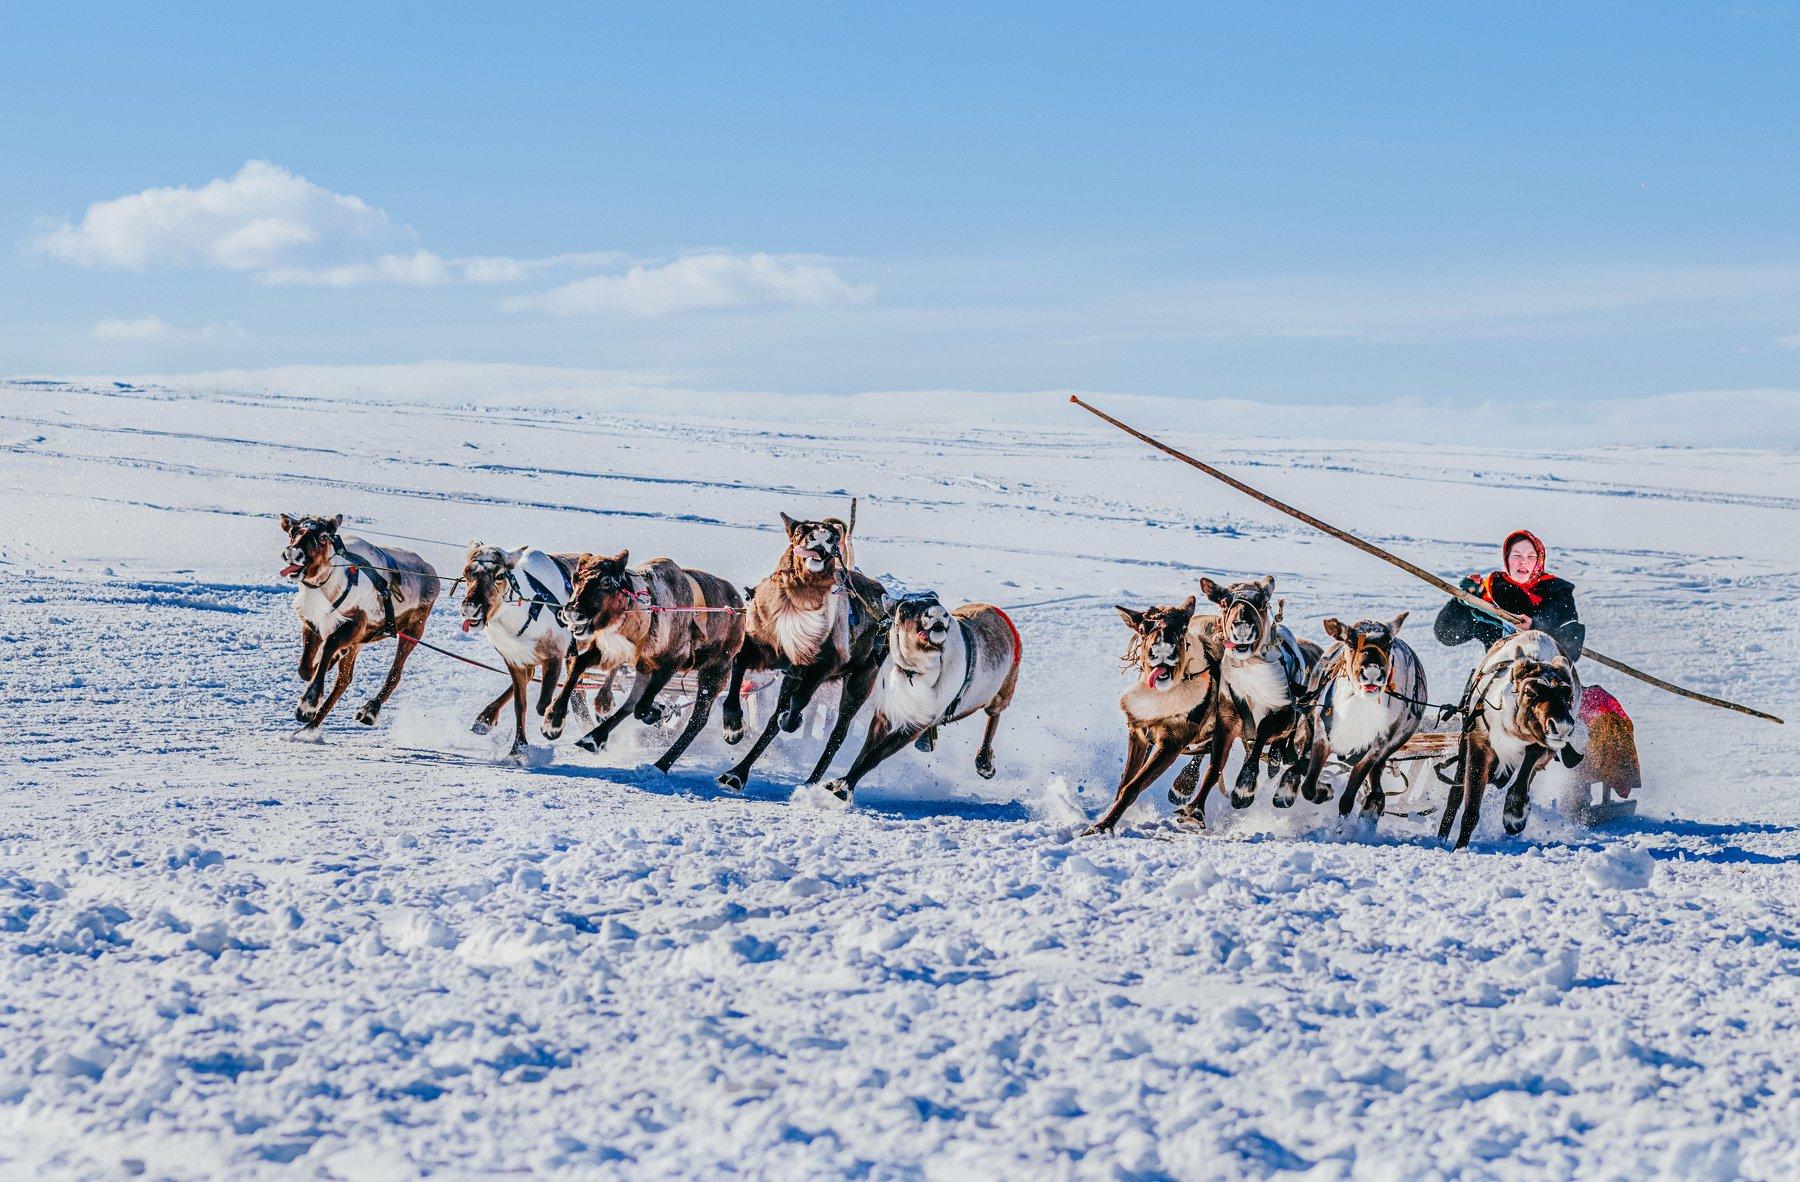 ямал , олени, природа, салехард , гонки, ямал , народы севера, Братцева Анастасия